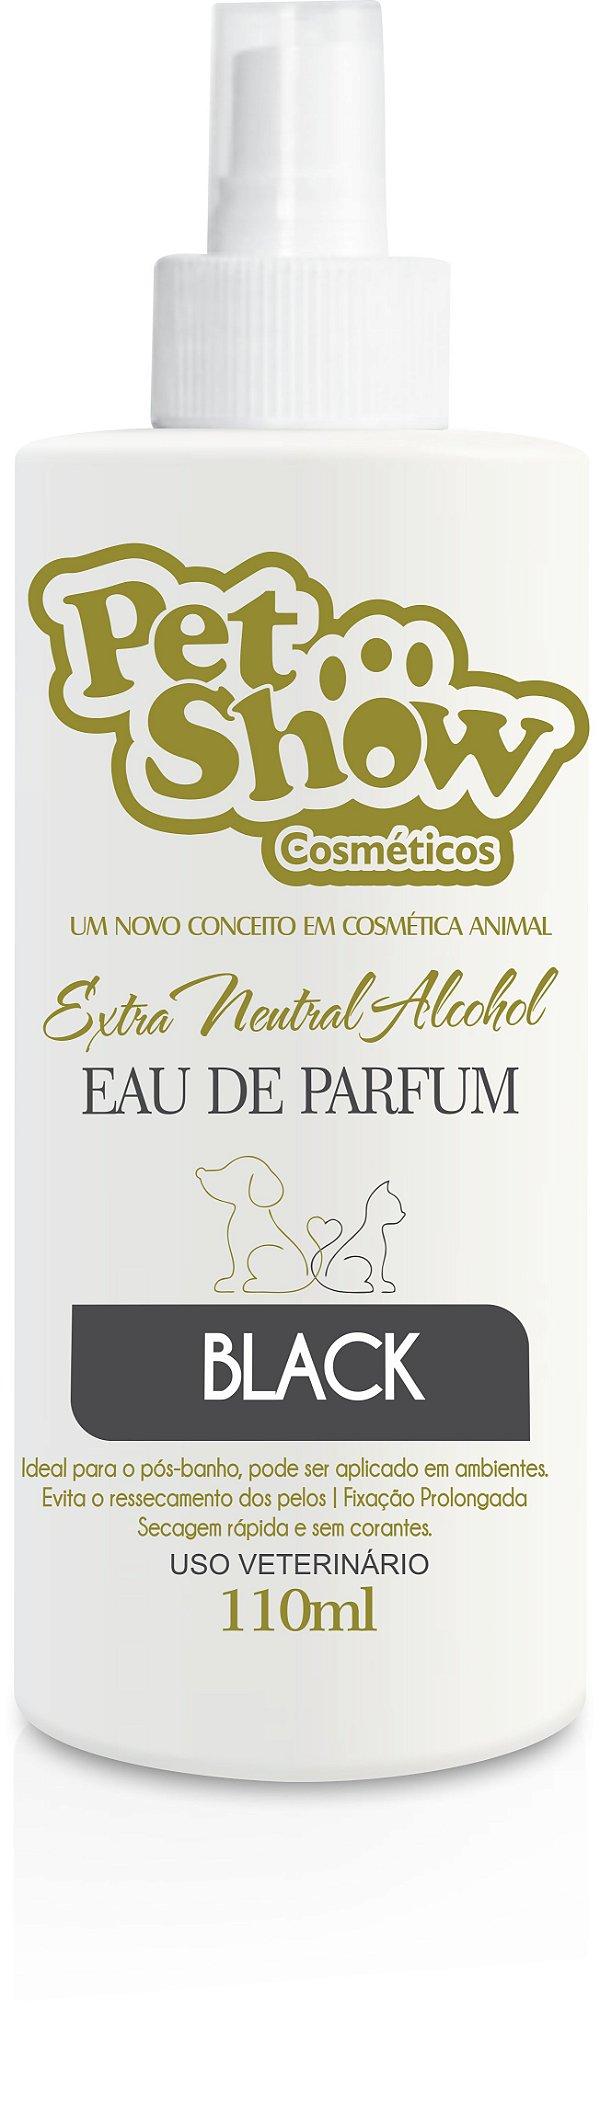 PERFUME BLACK 110 ML - PET SHOW